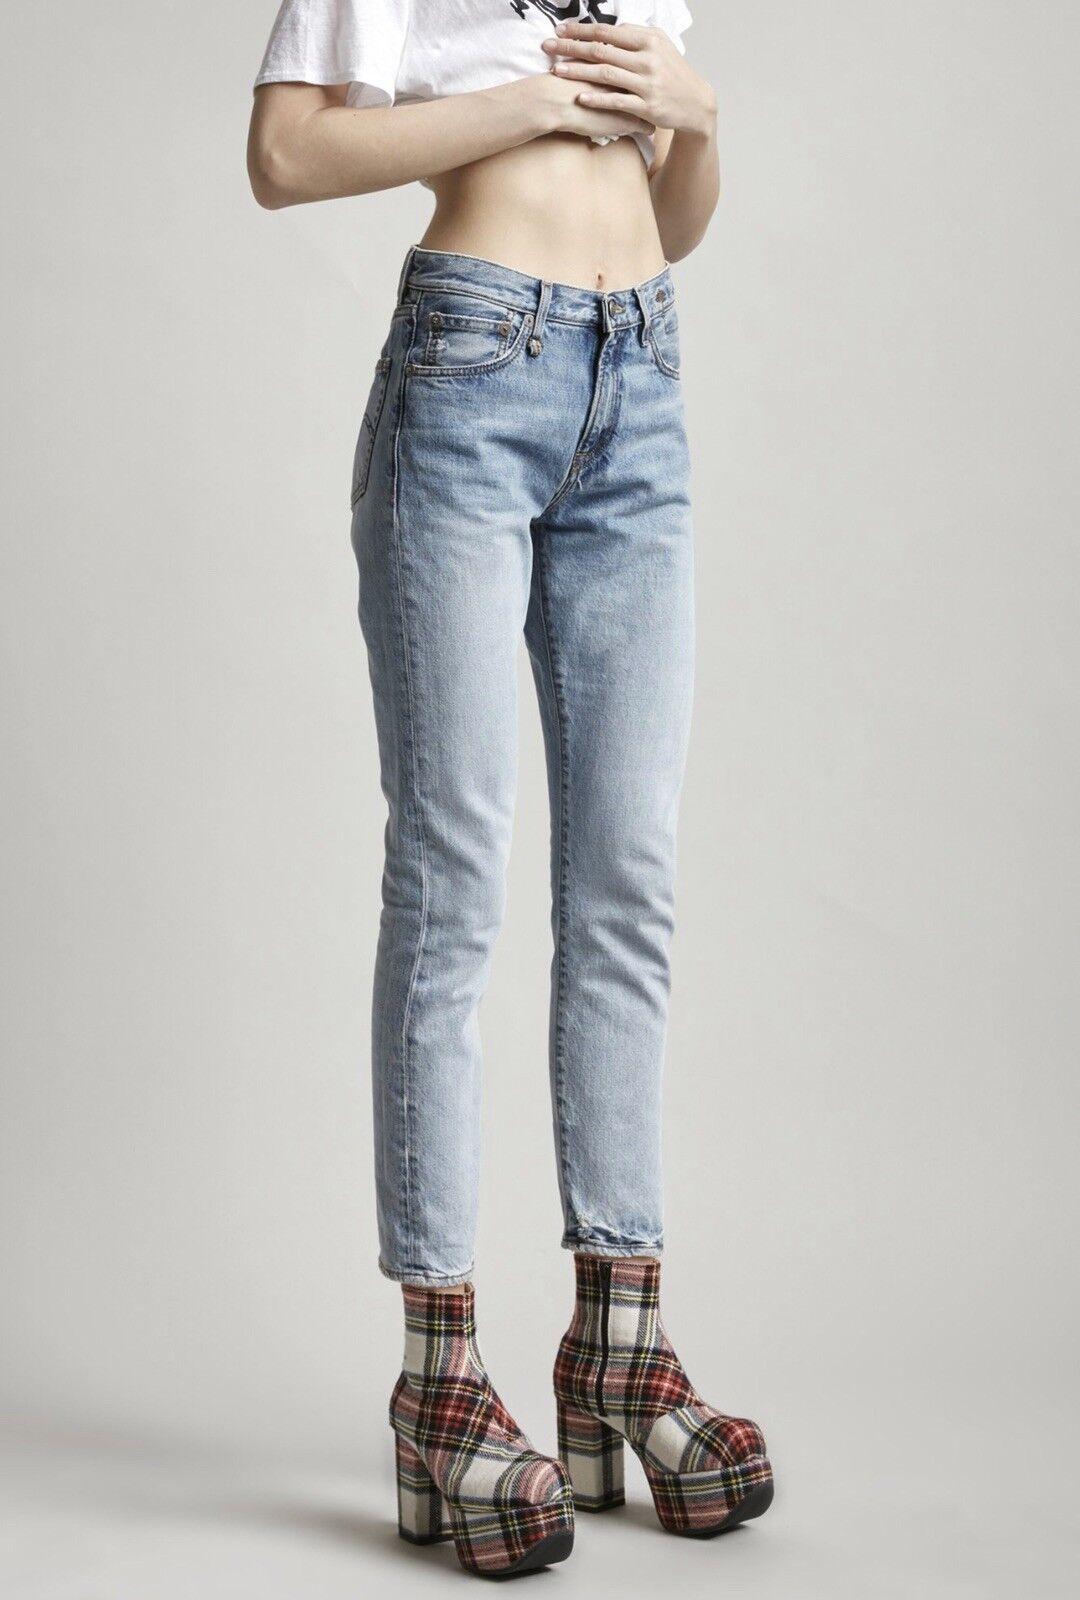 R13 Denim MILF Jeans Size 26 High Waist Light bluee 100% Cotton Distressed NWT